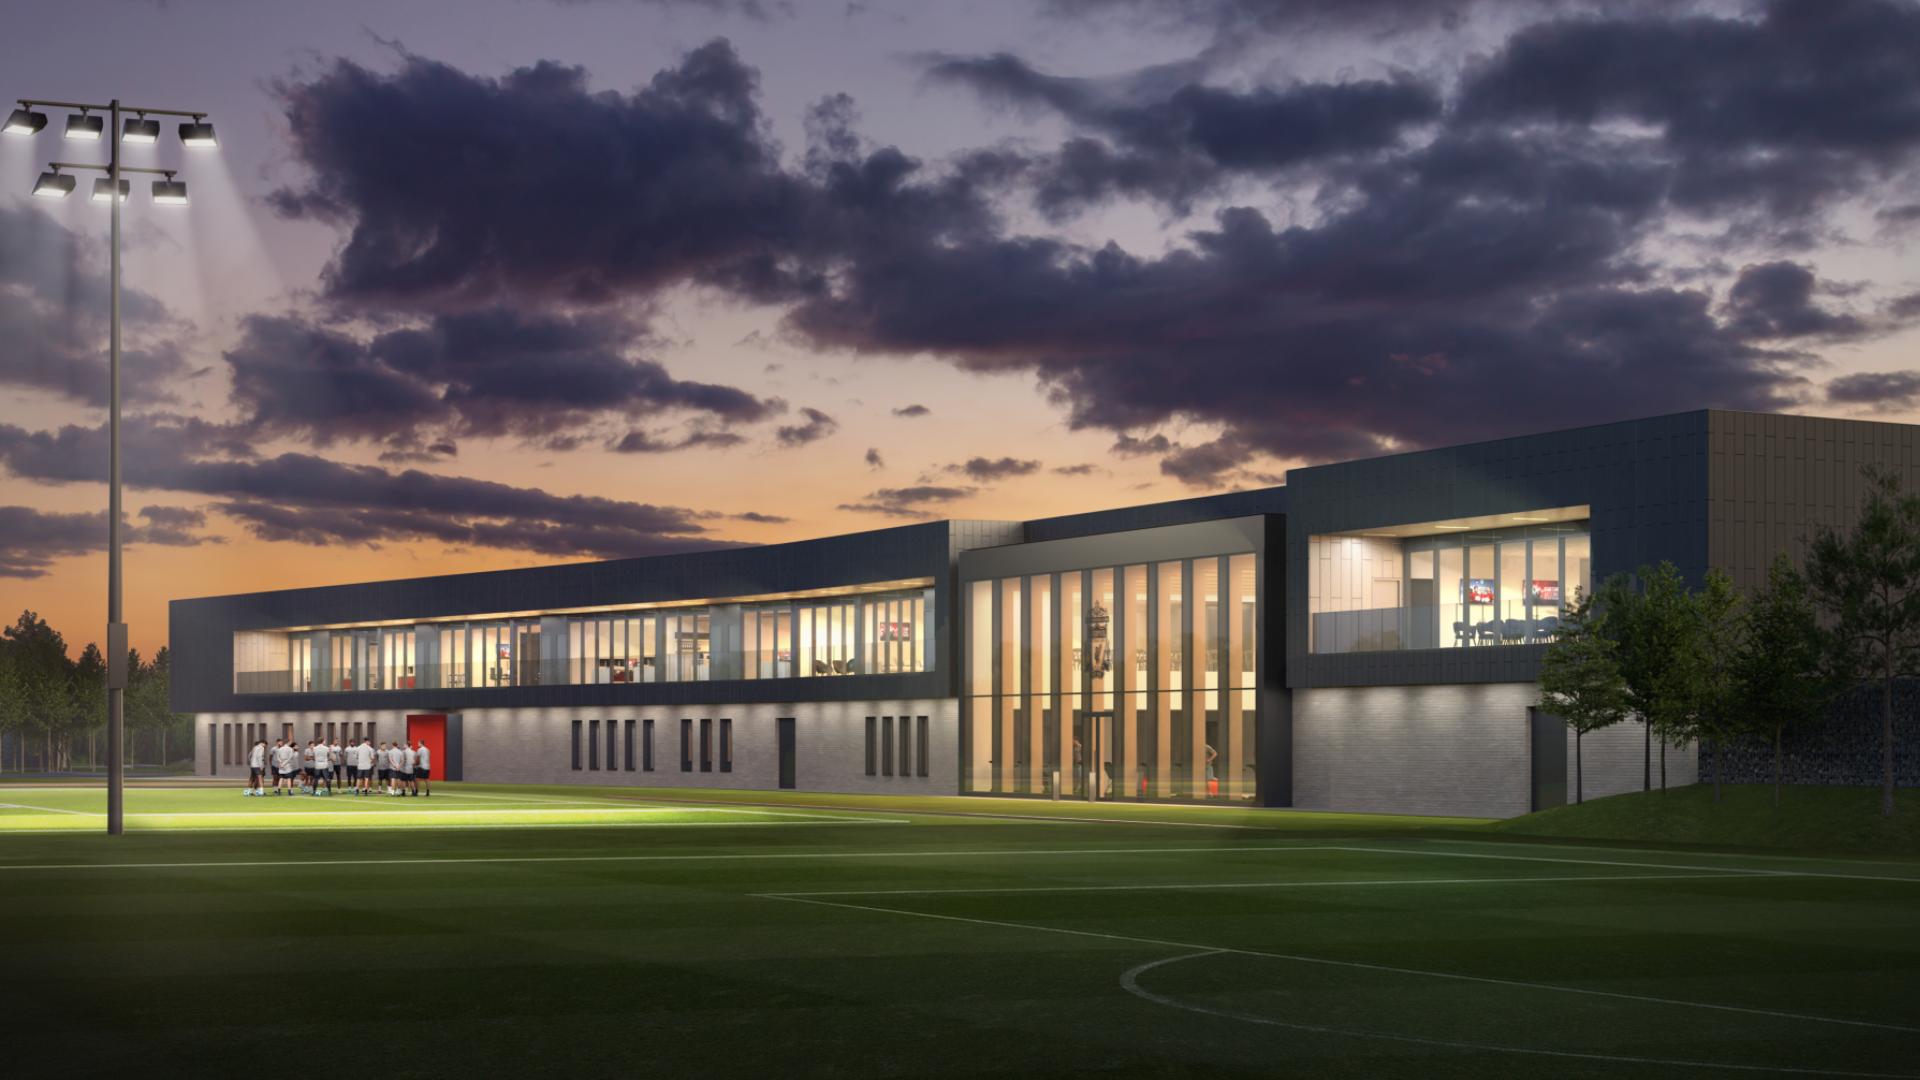 New Liverpool training ground (artists impression)